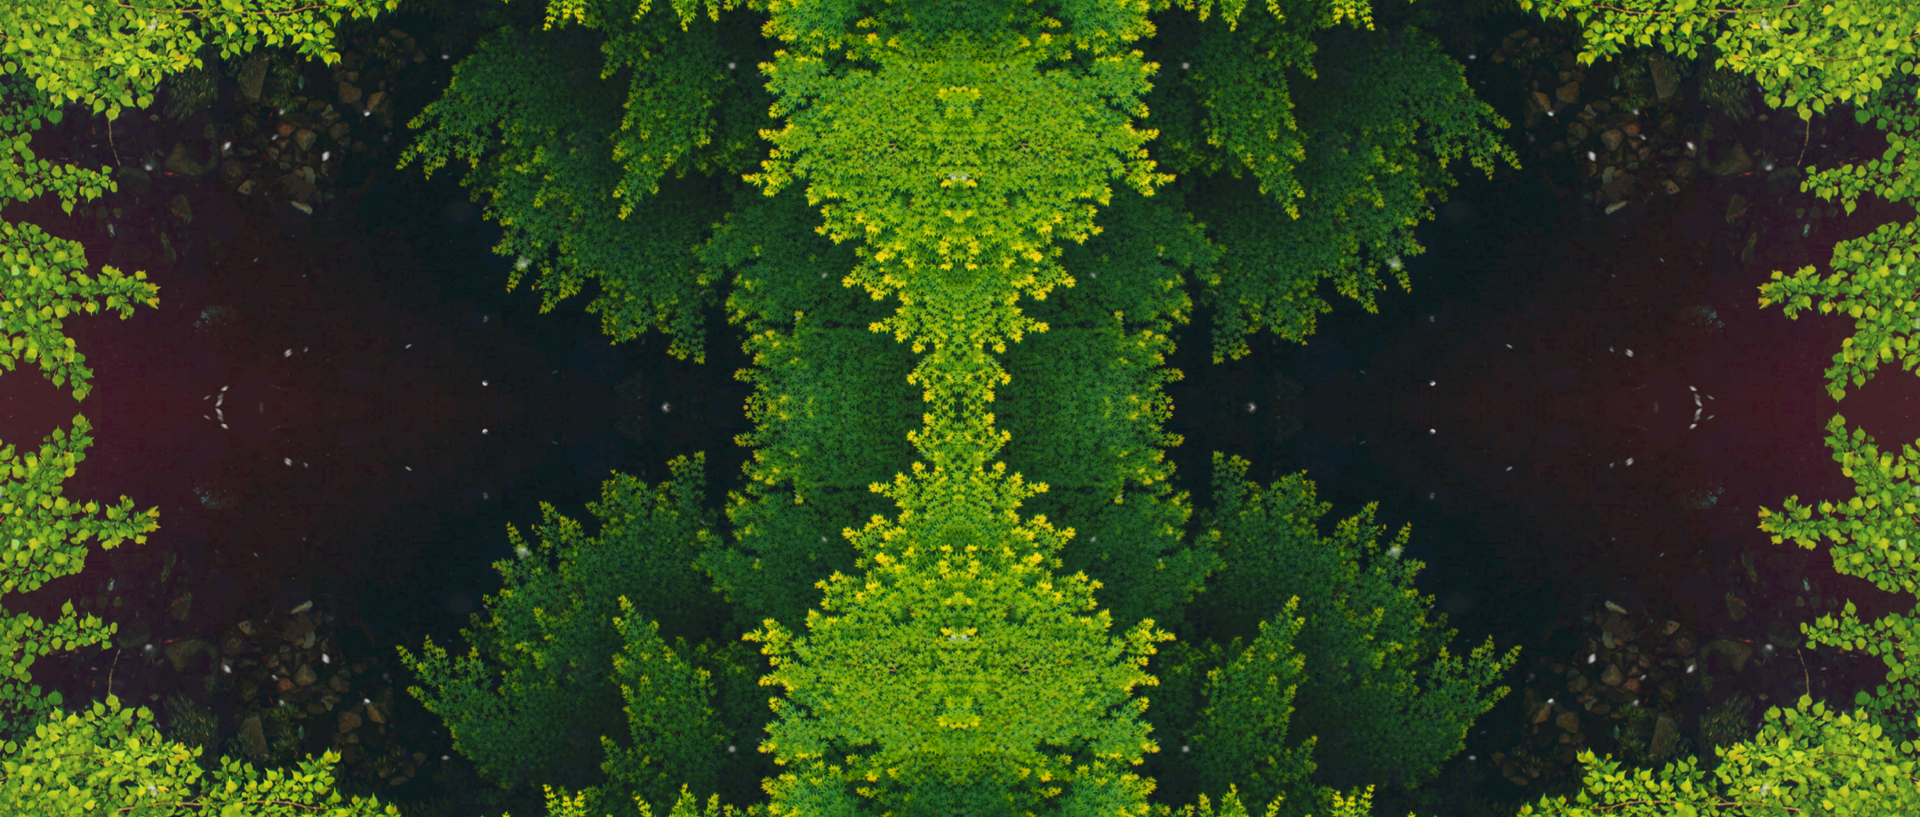 tycho_easy_fractal_01